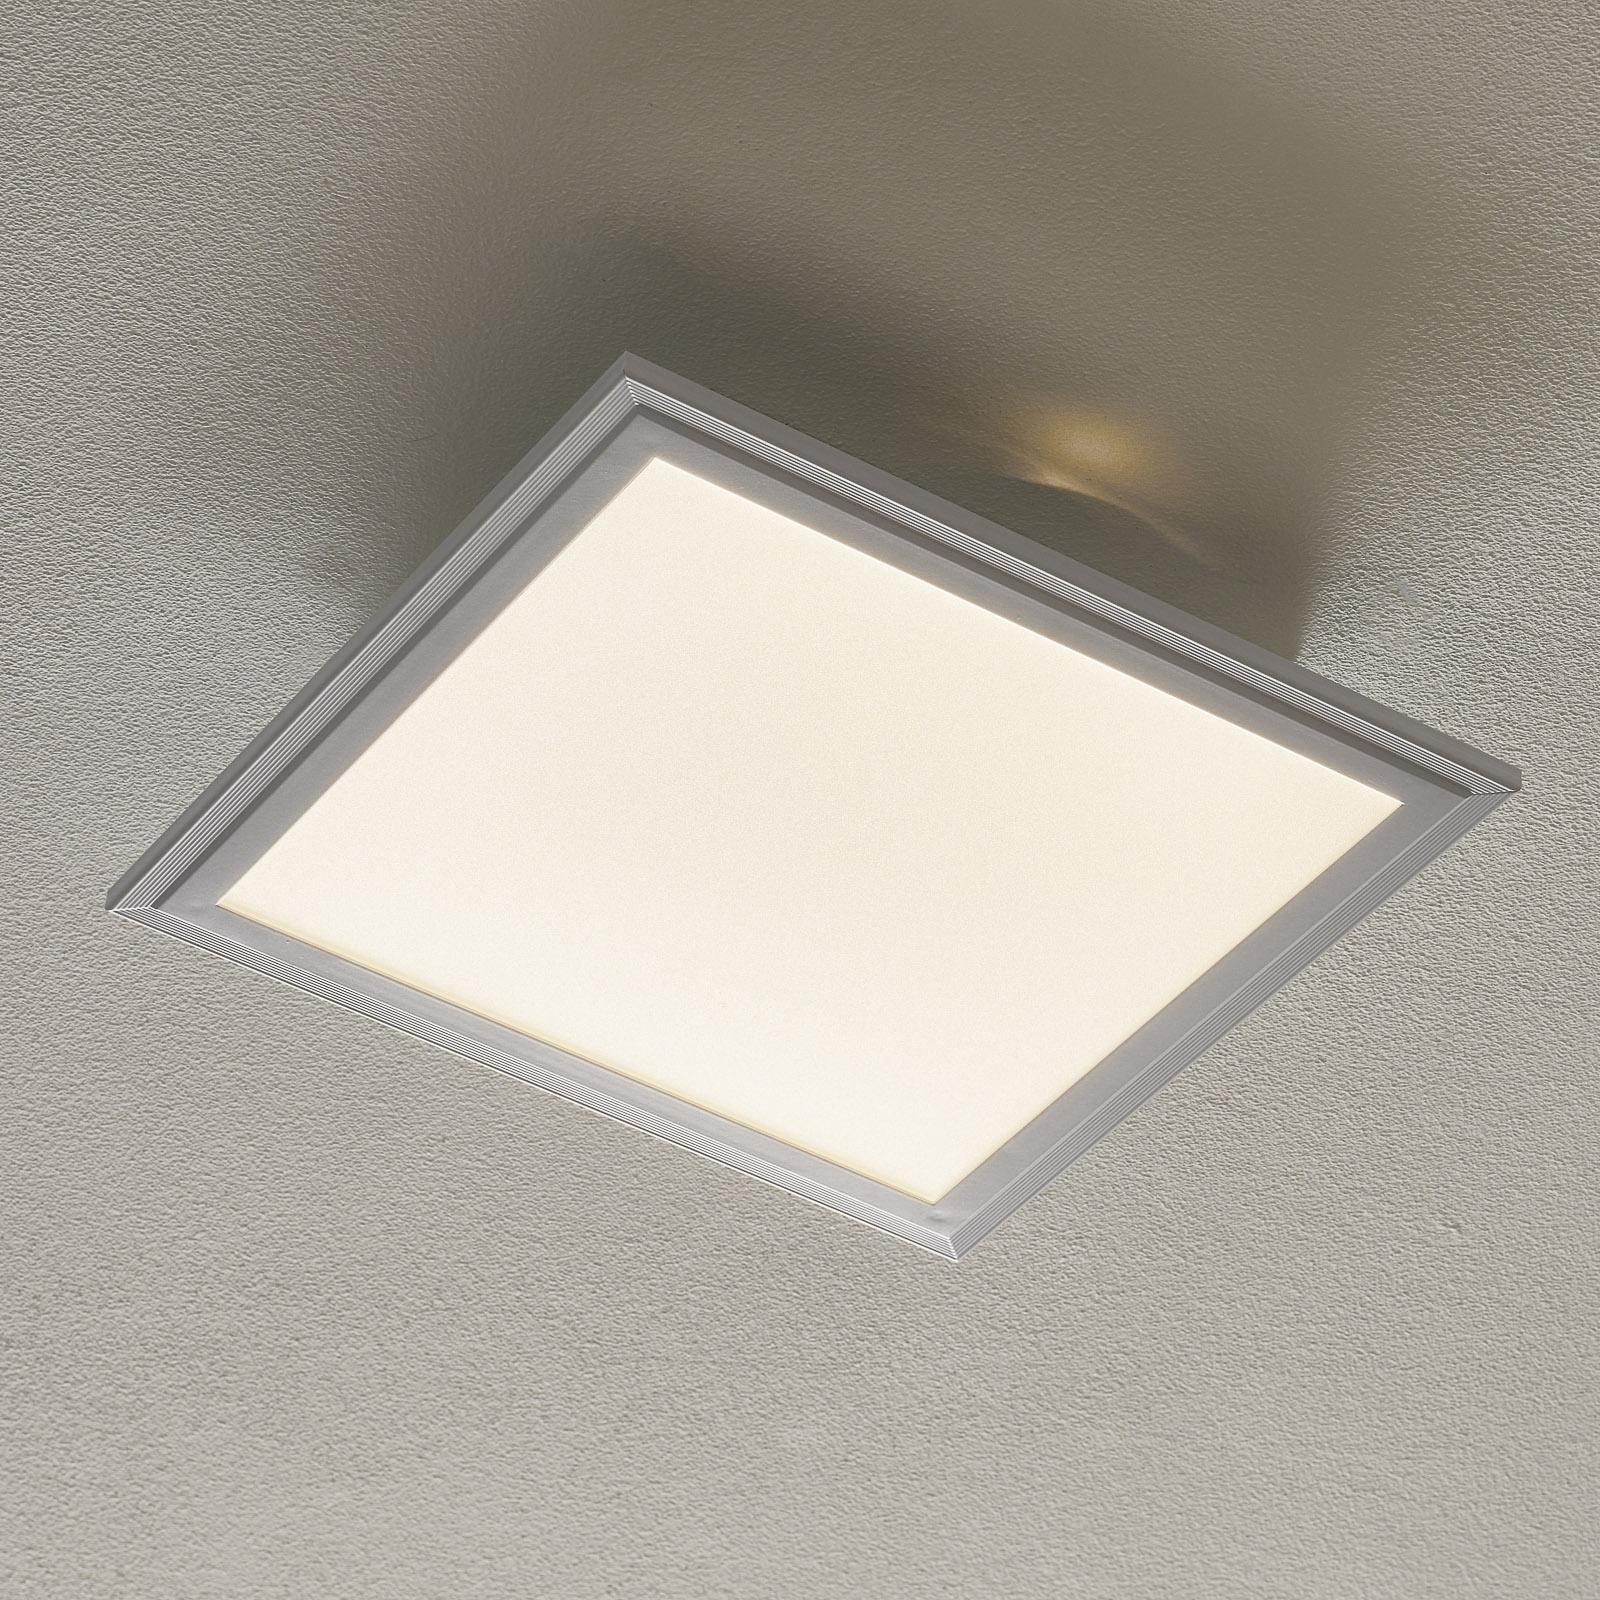 EGLO connect Salobrena-C LED-Panel, weiß 30x30 cm